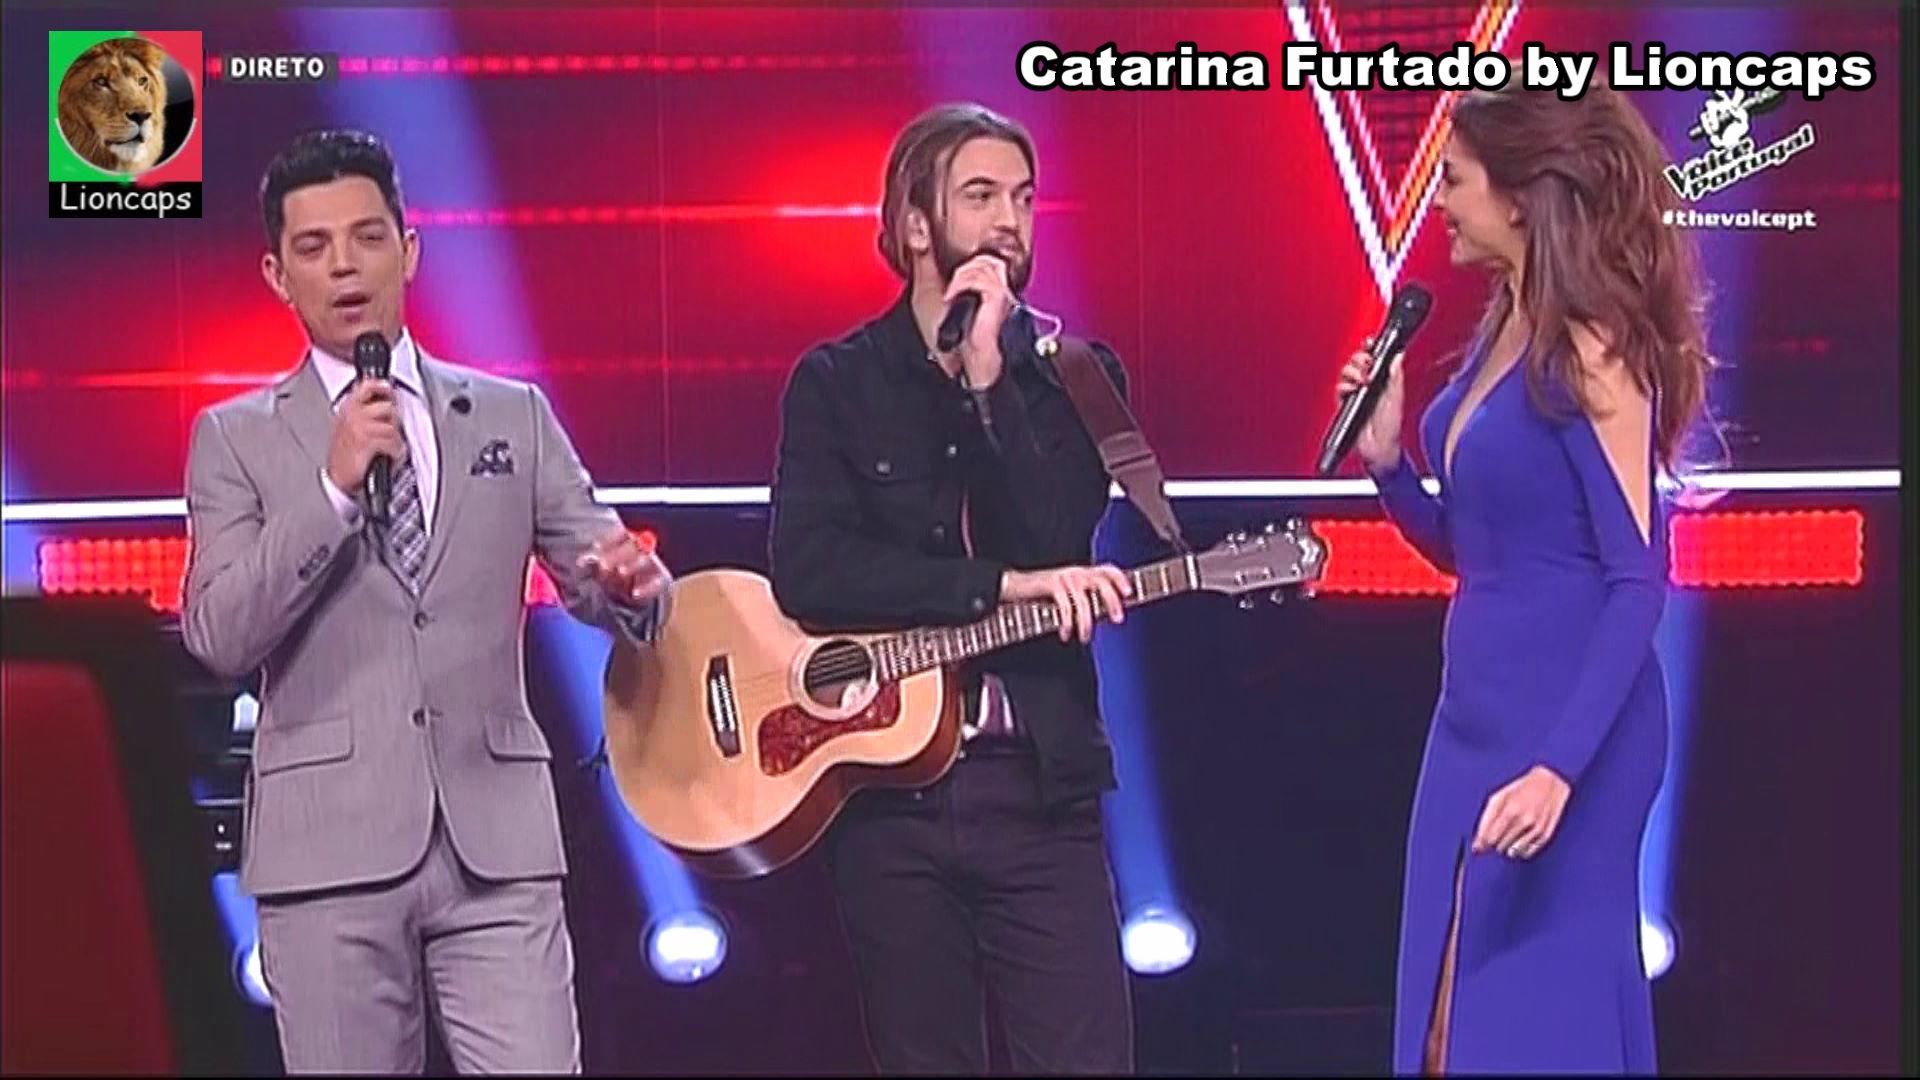 342987439_catarina_furtado_vs190324_0563_122_45lo.JPG